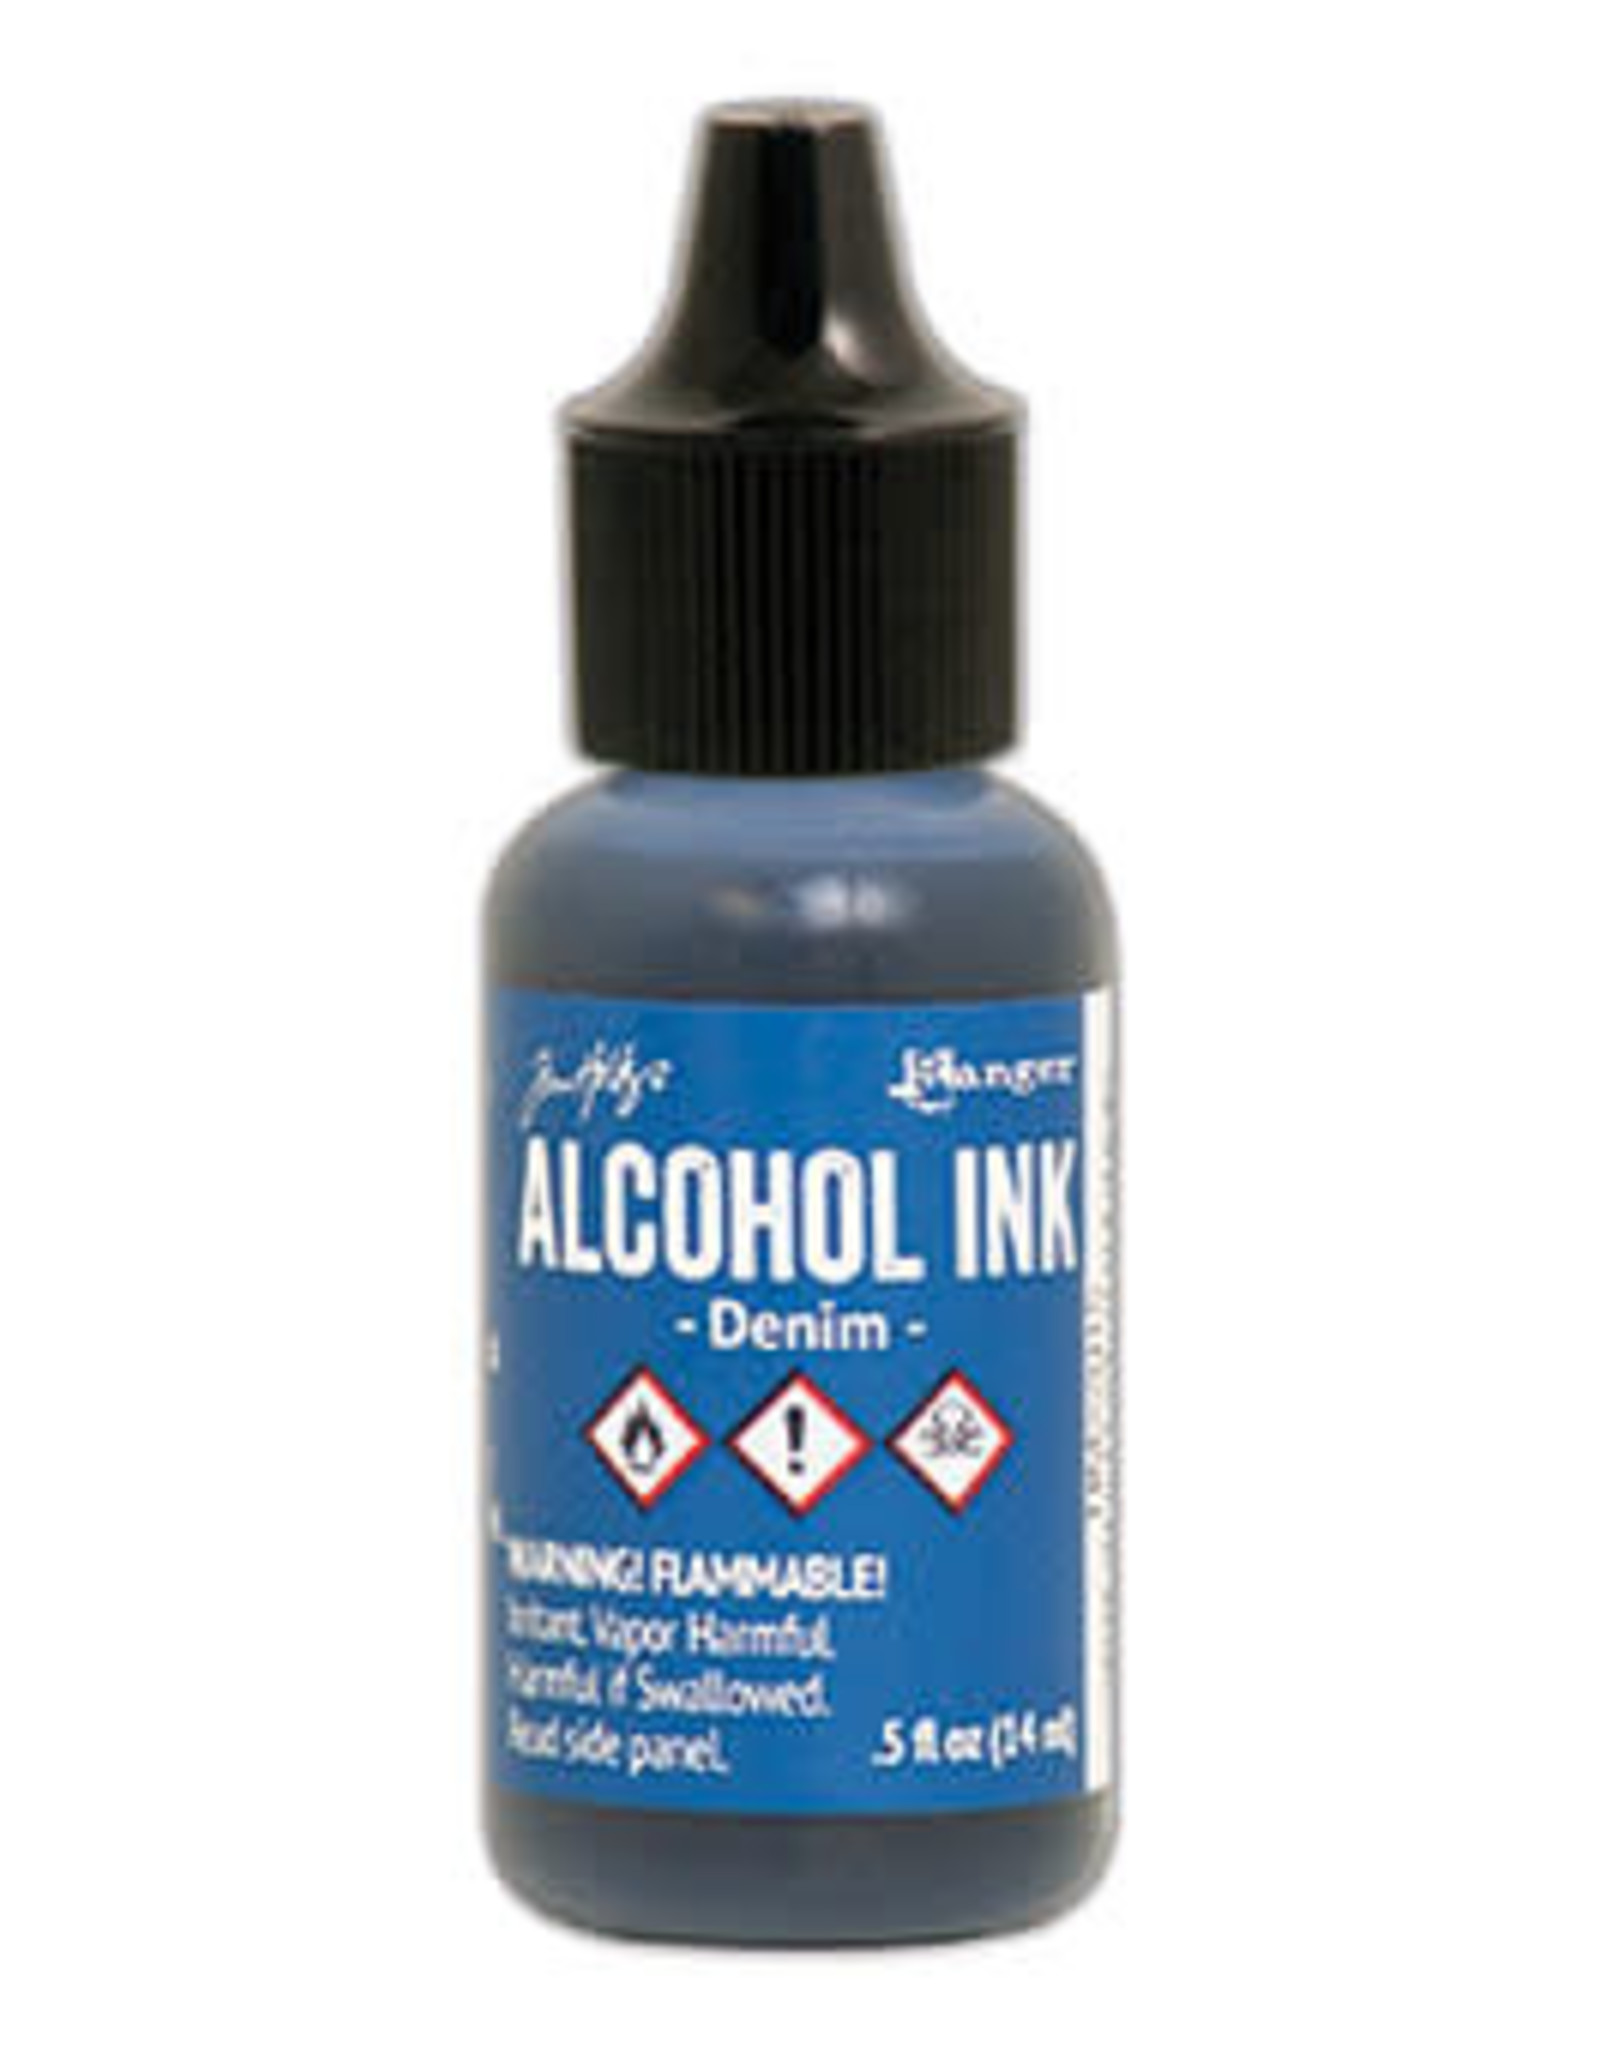 Tim Holtz Alcohol Ink 1/2 oz Denim